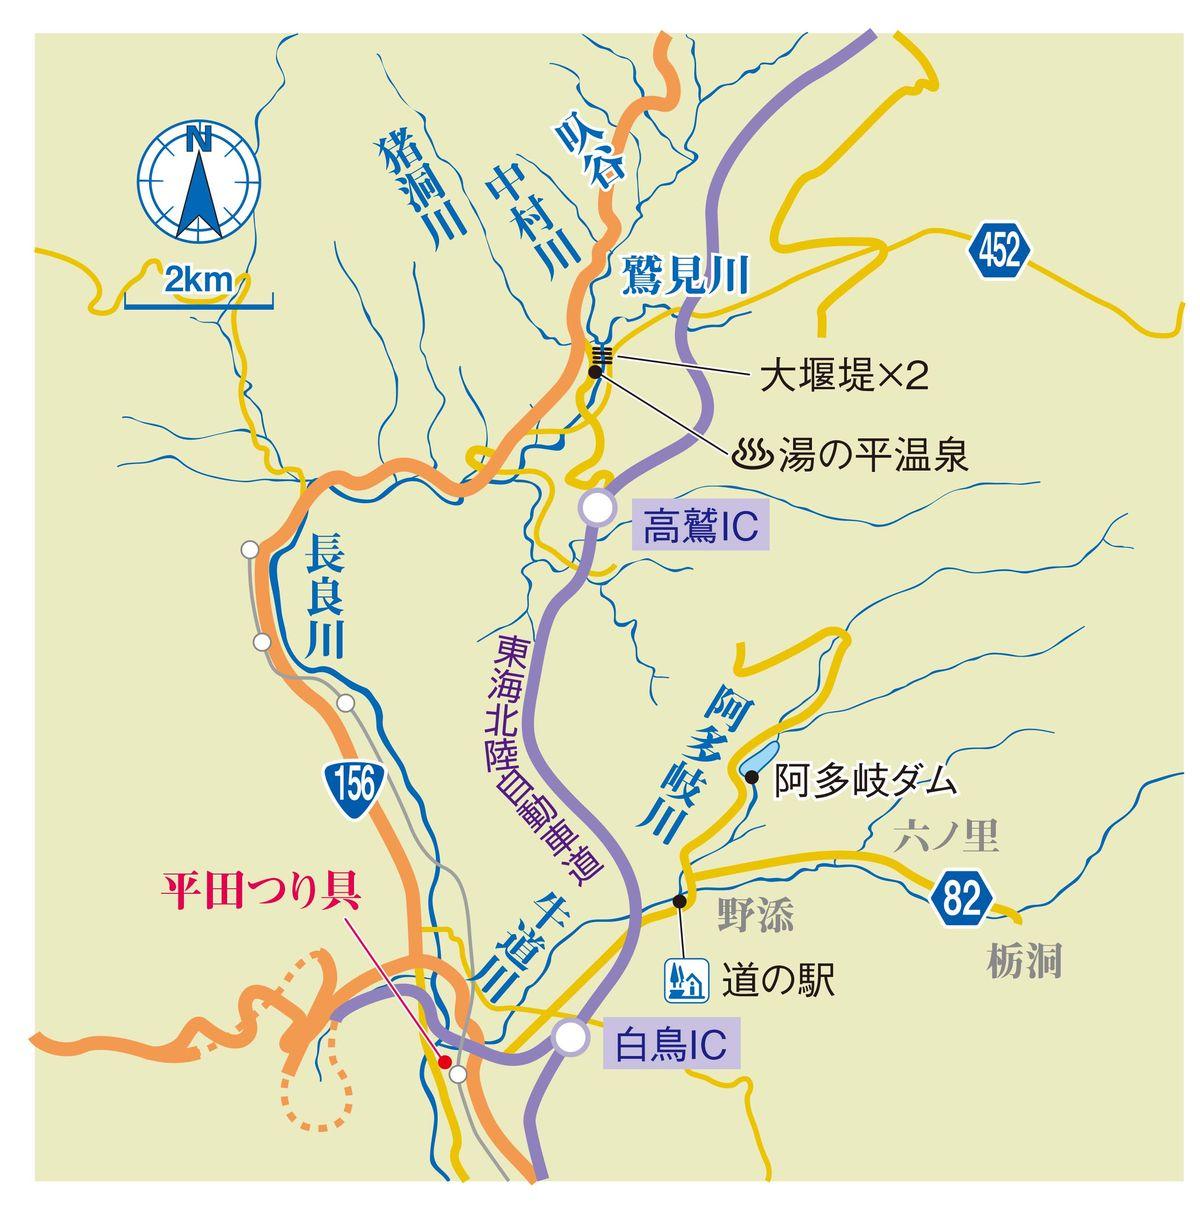 039-051best keiryu_cs6 (5)